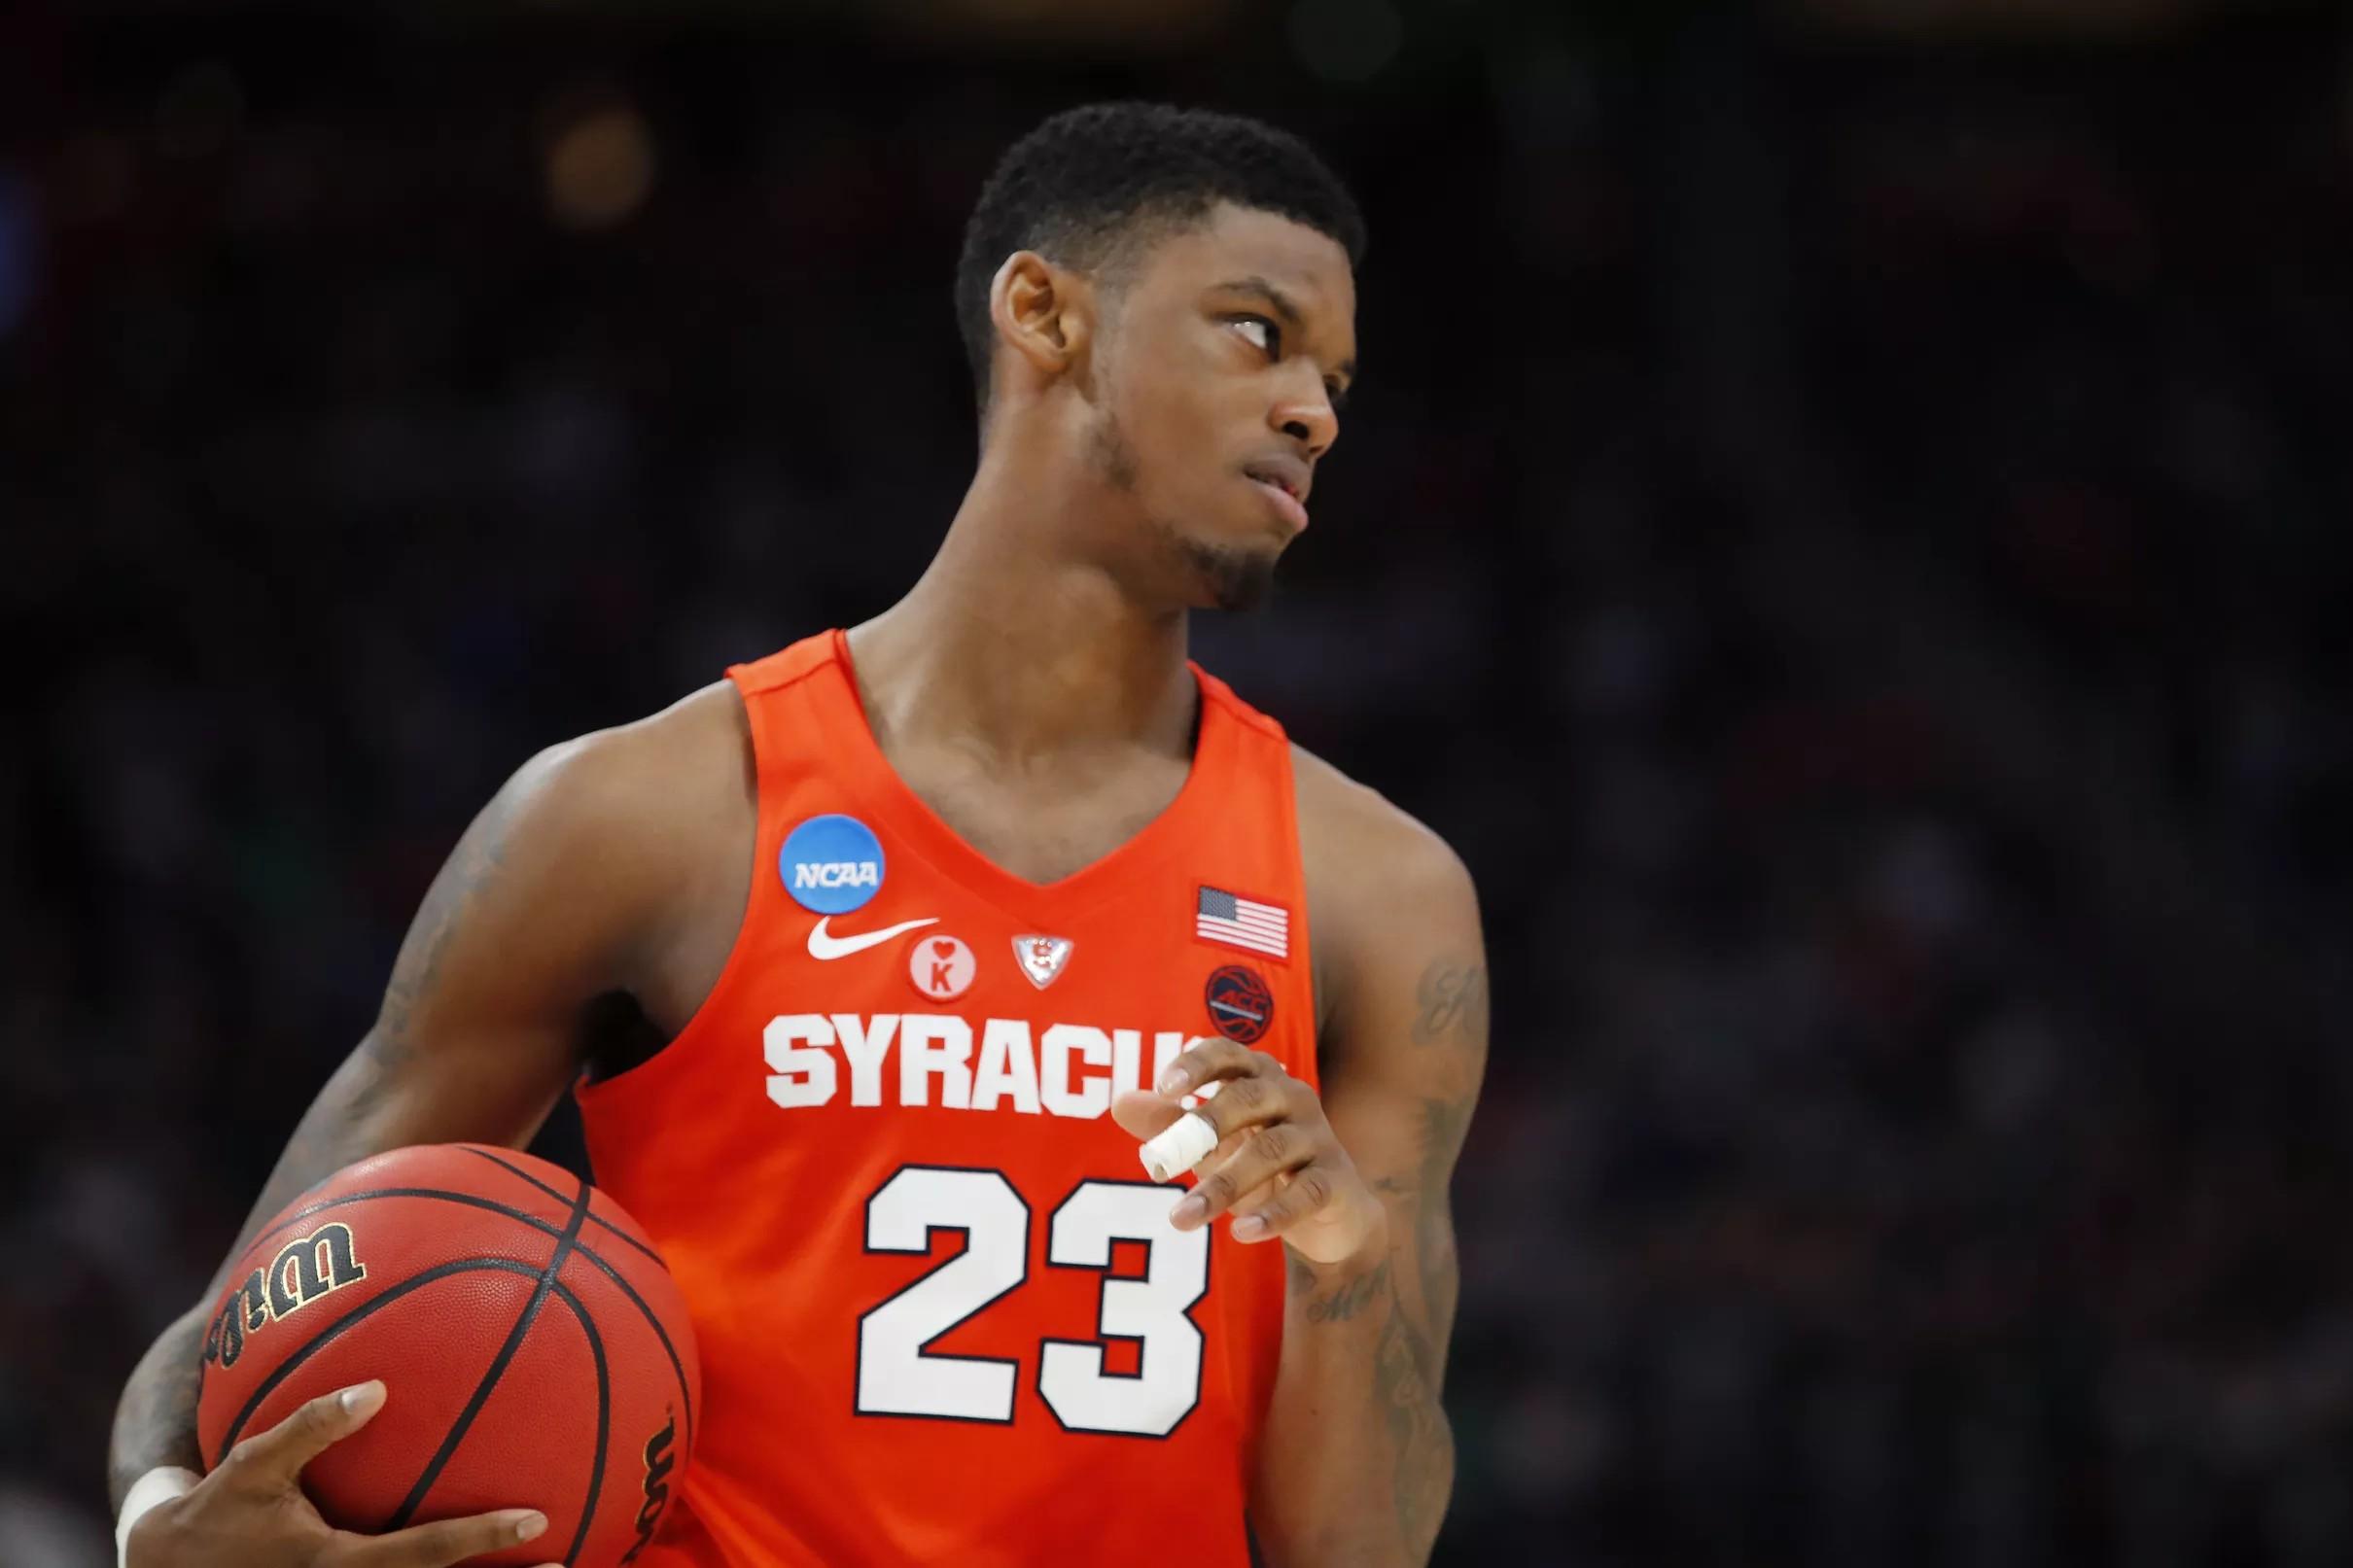 Syracuse Basketball Frank Howard Suffers Lower Left Leg Injury